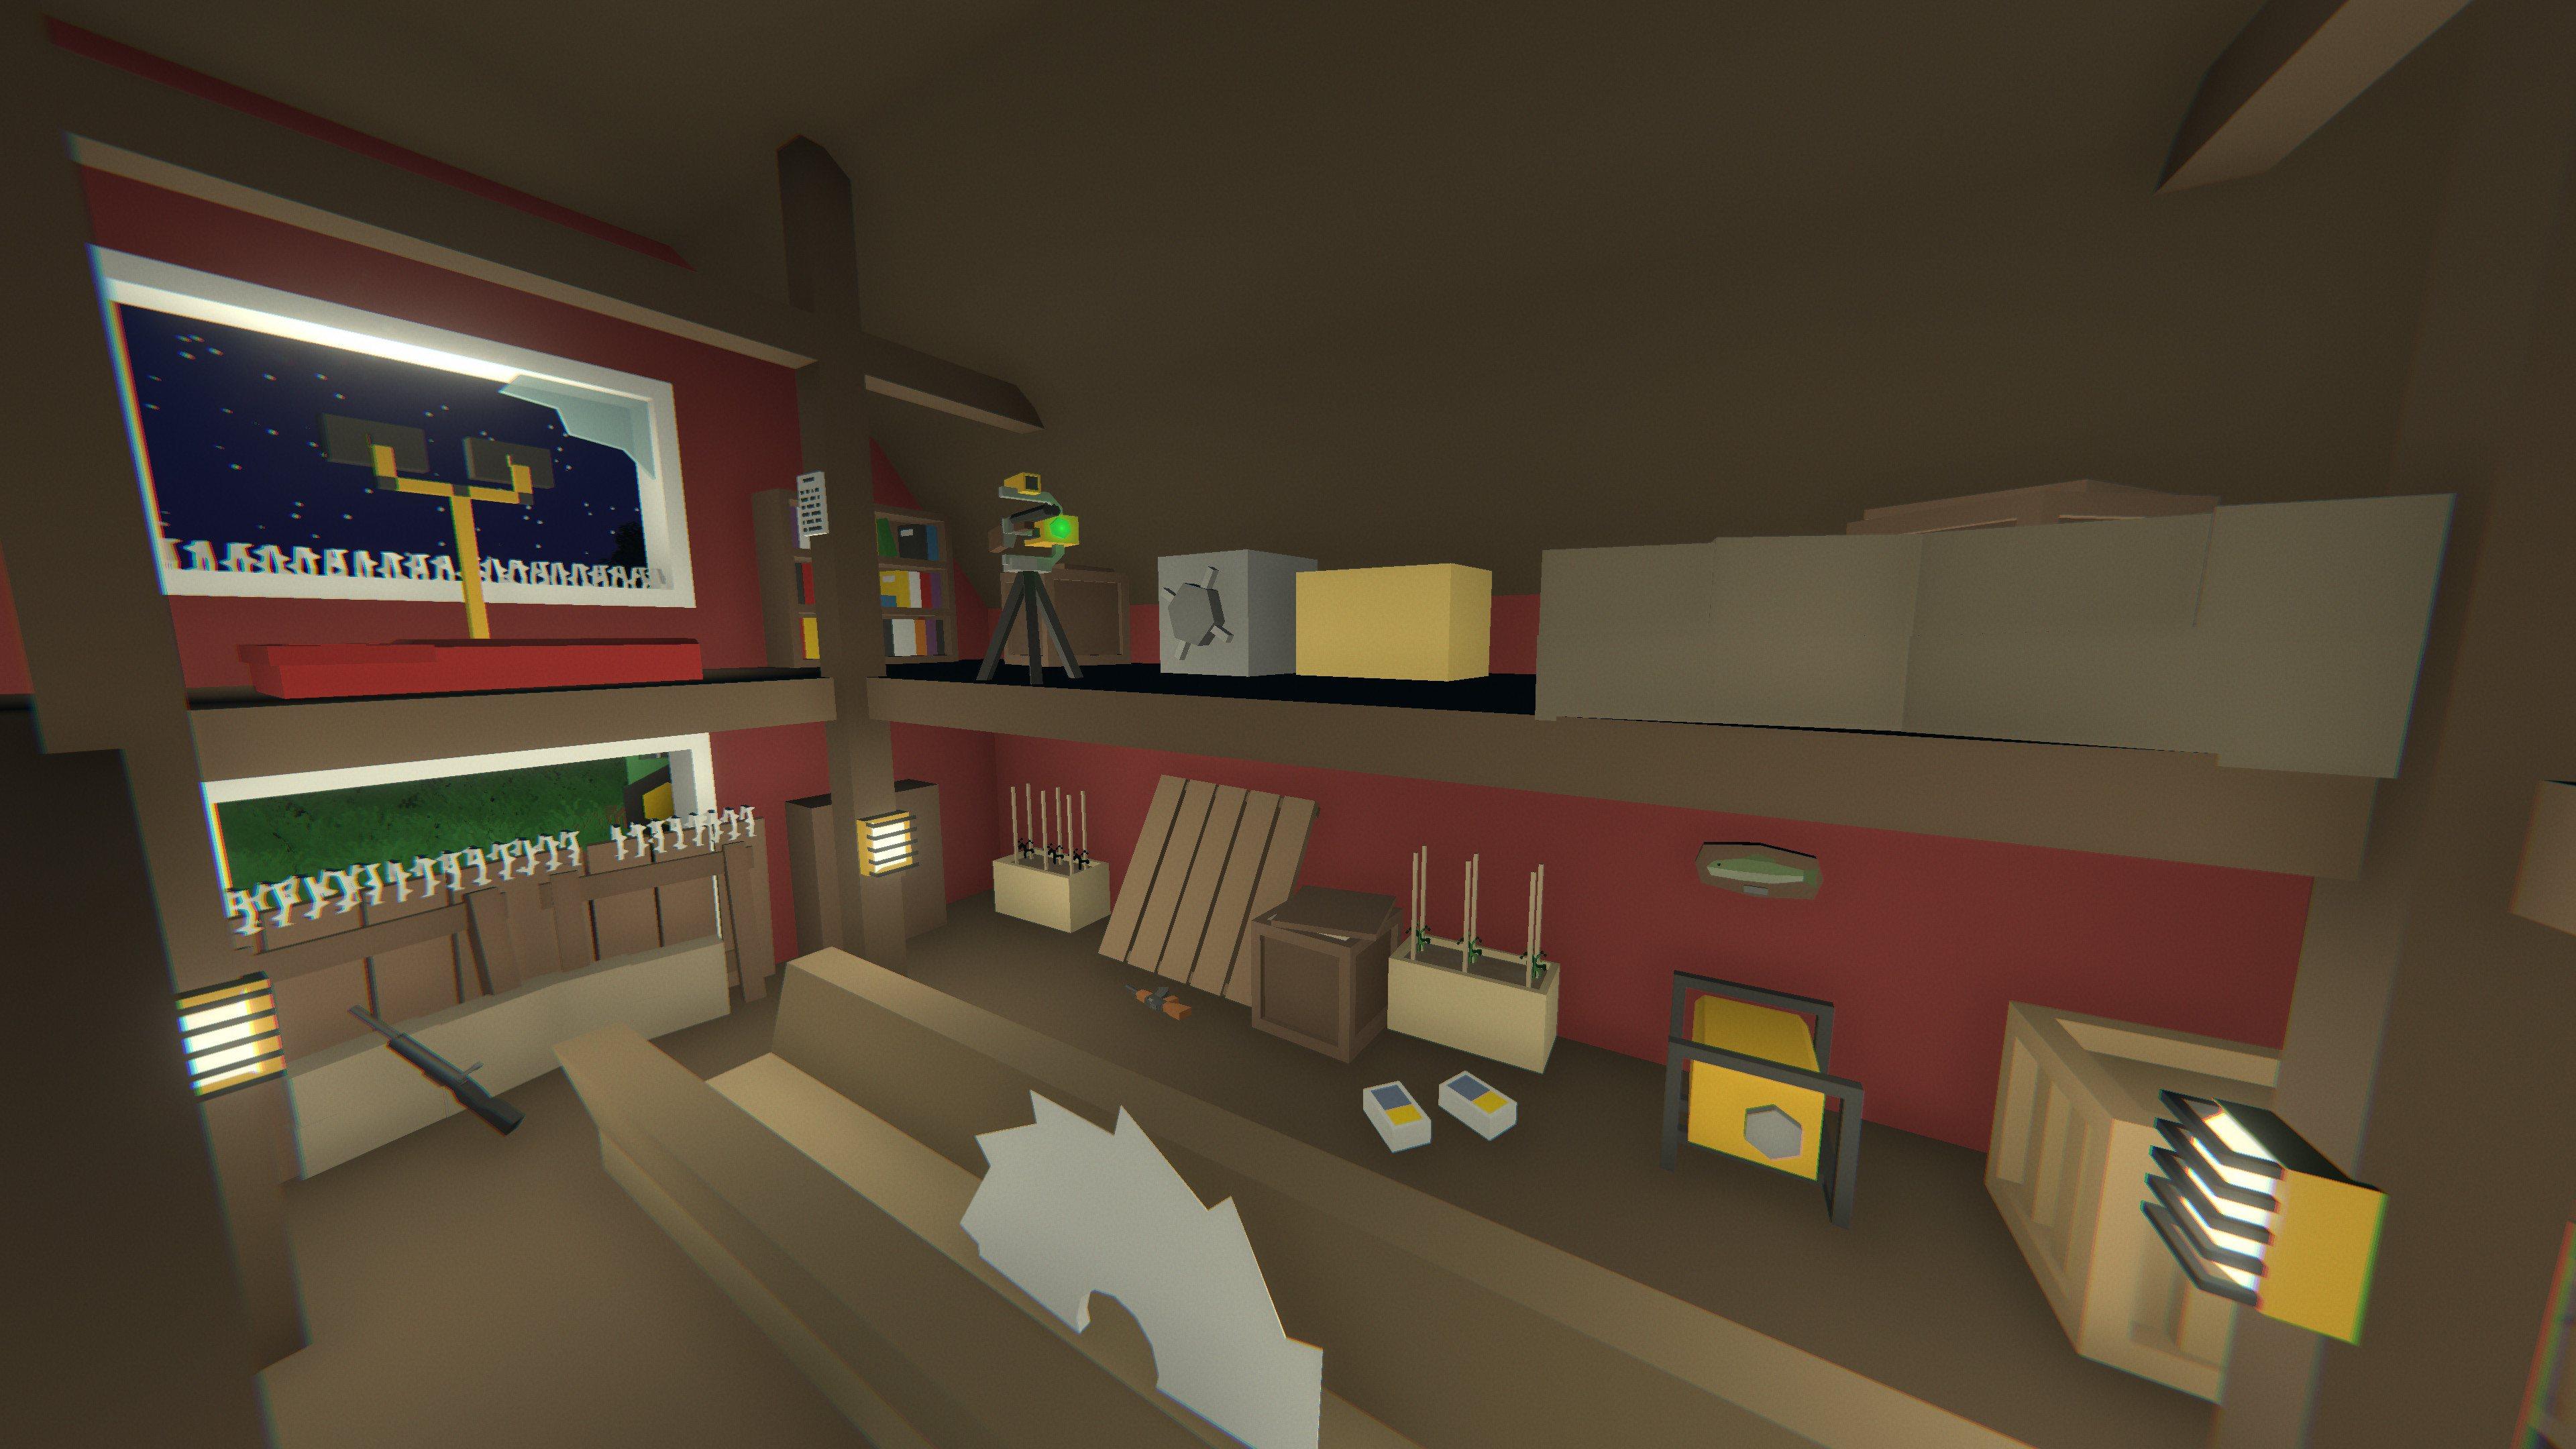 5-gier-podobnych-do-minecraft-unturned-2.jpg